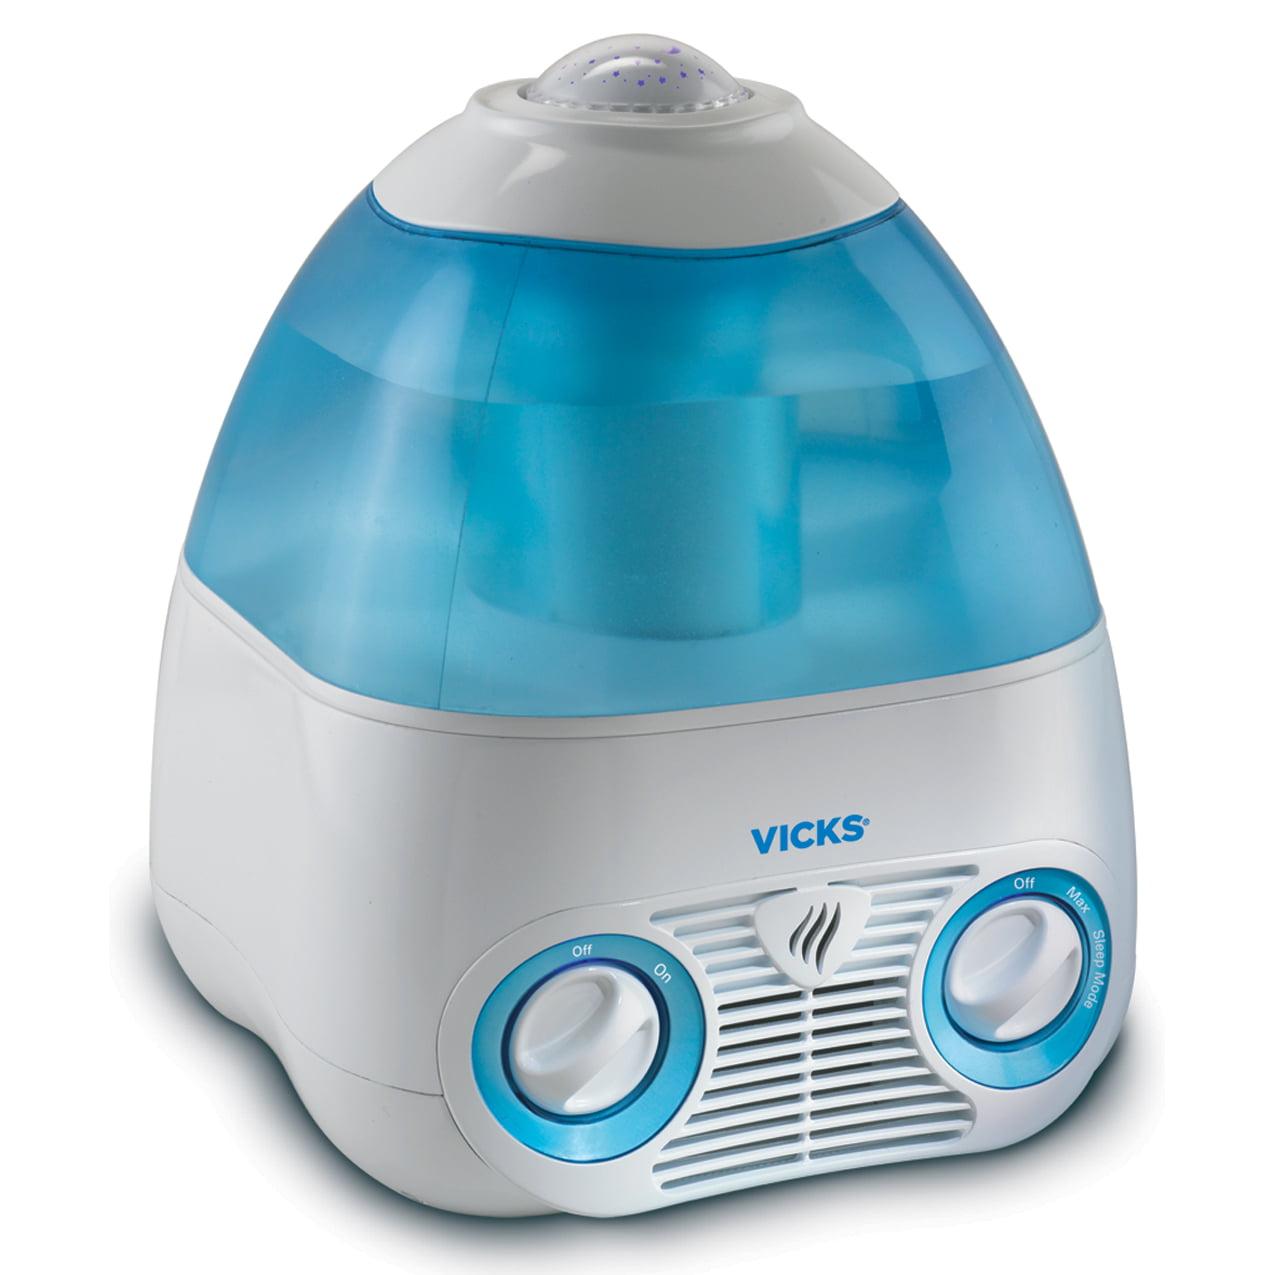 Walmart Humidifier No Filter vicks v3700 starry night cool mist humidifier - walmart